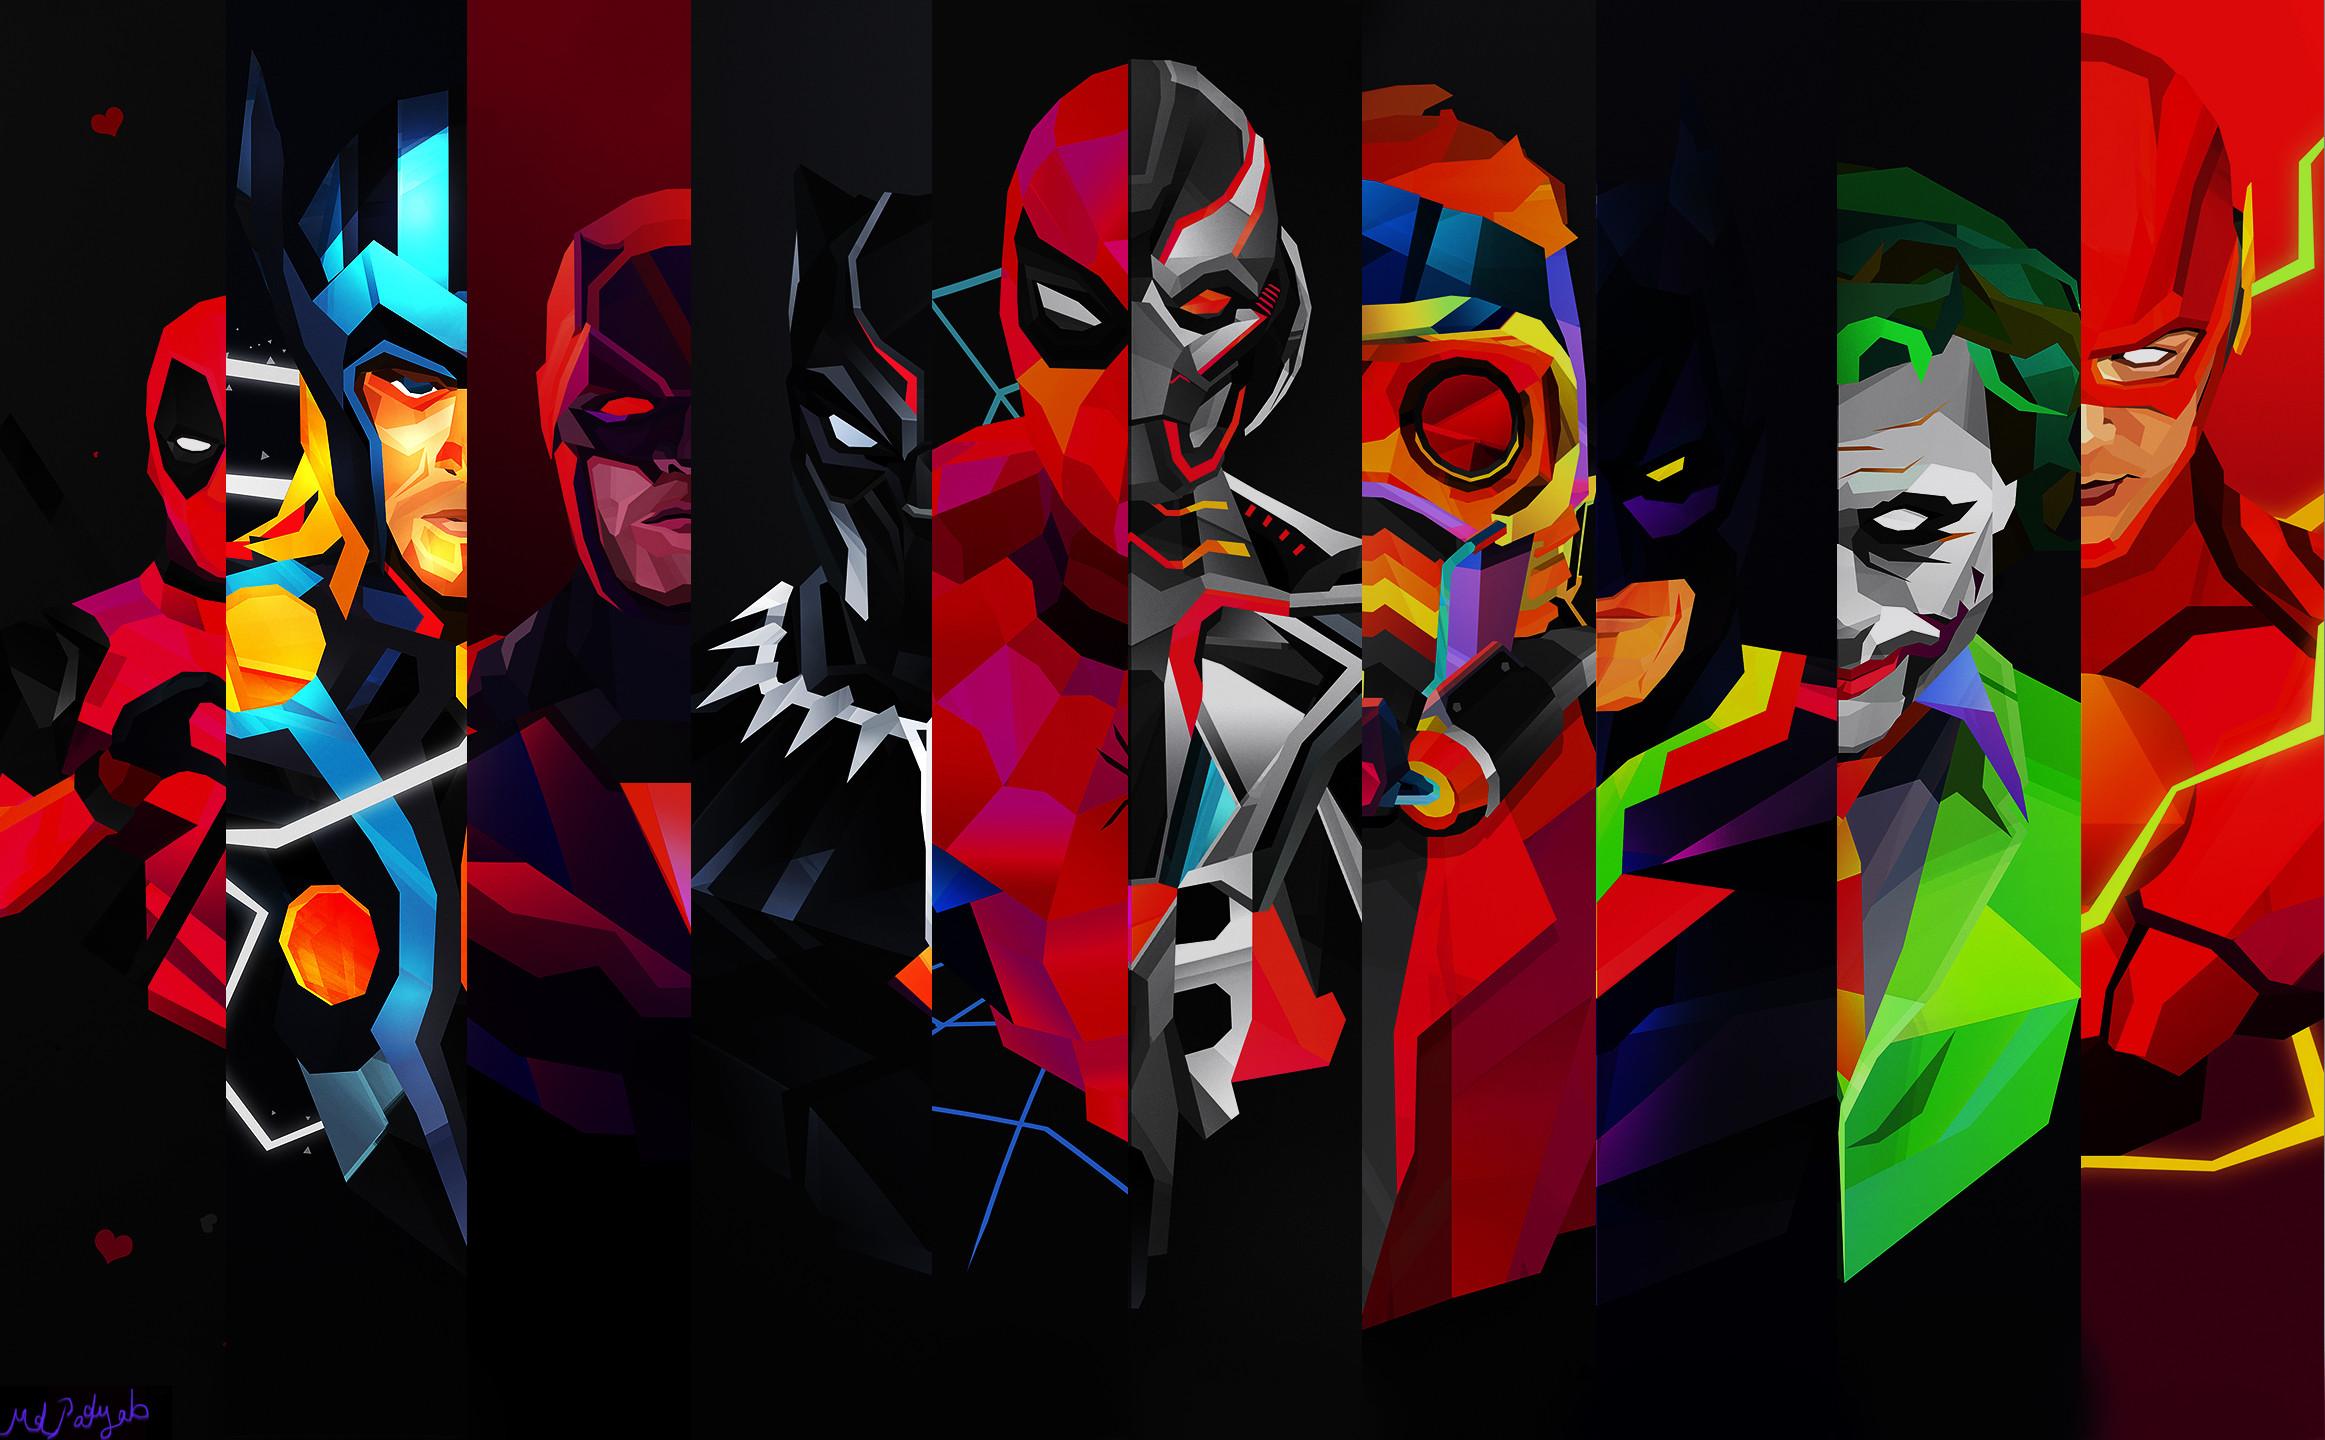 Must see Wallpaper High Resolution Superhero - 133994  Gallery_285093.jpg